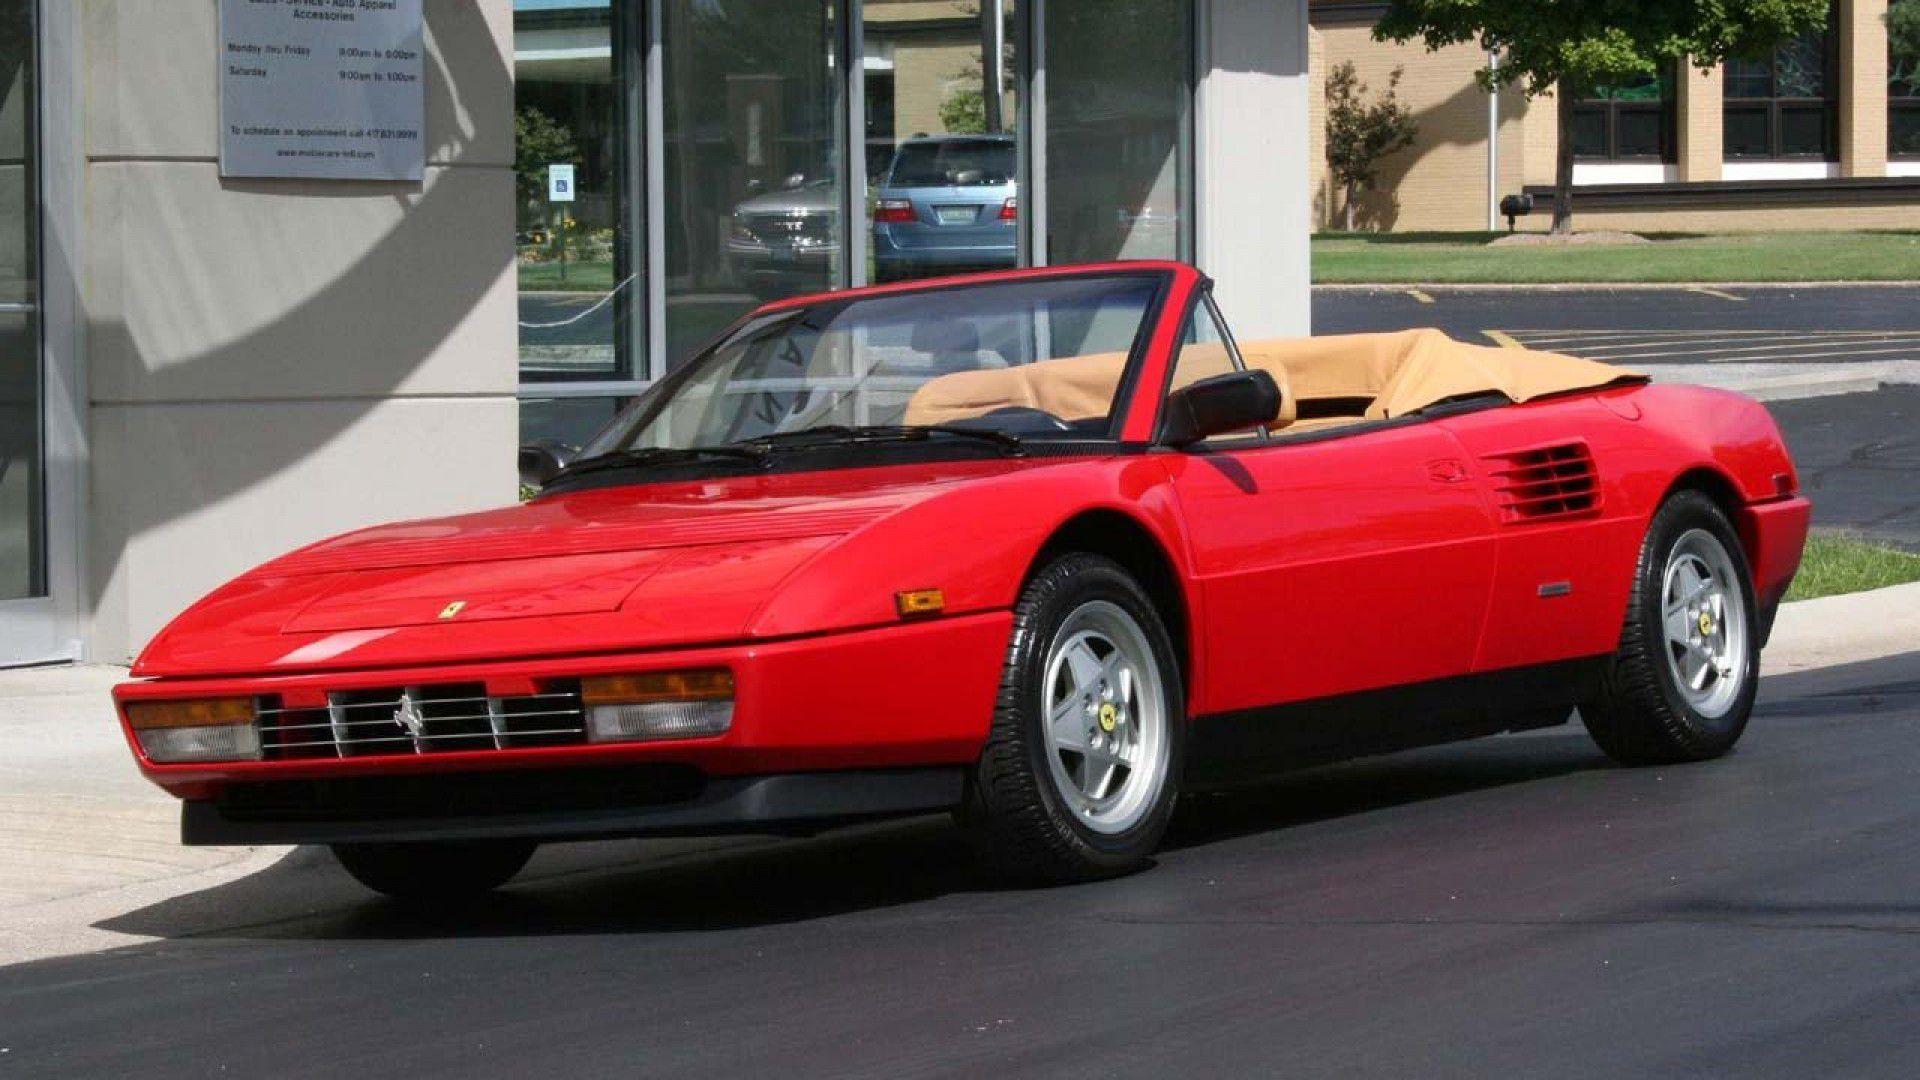 Ferrari 3.2 Mondial Coupe & 3.2 Mondial Cabriolet